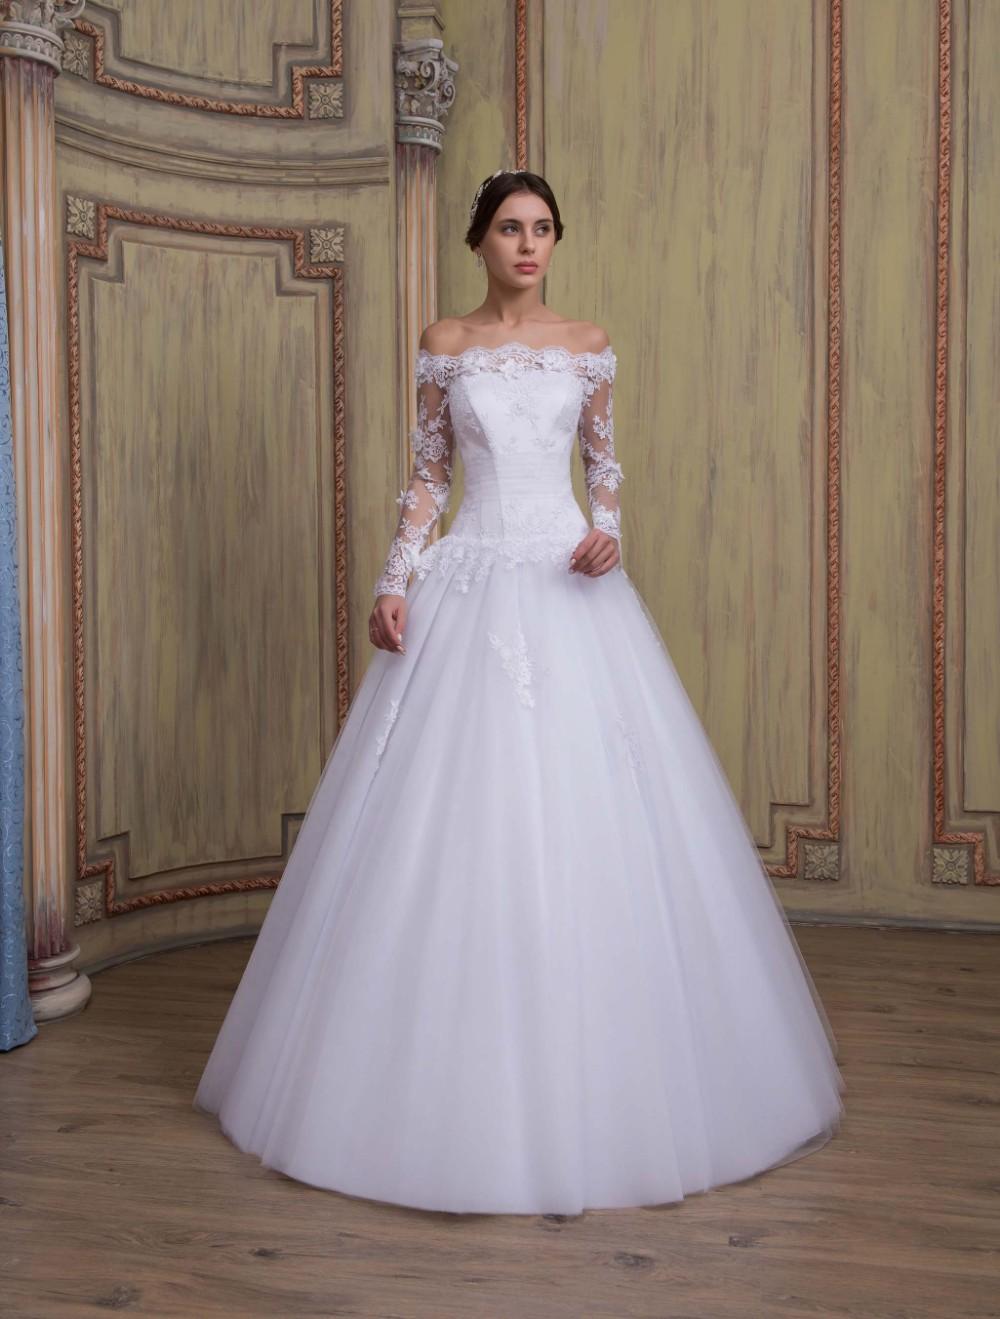 814287b9b67 Bridesmaid Dress Shopping In London - Gomes Weine AG